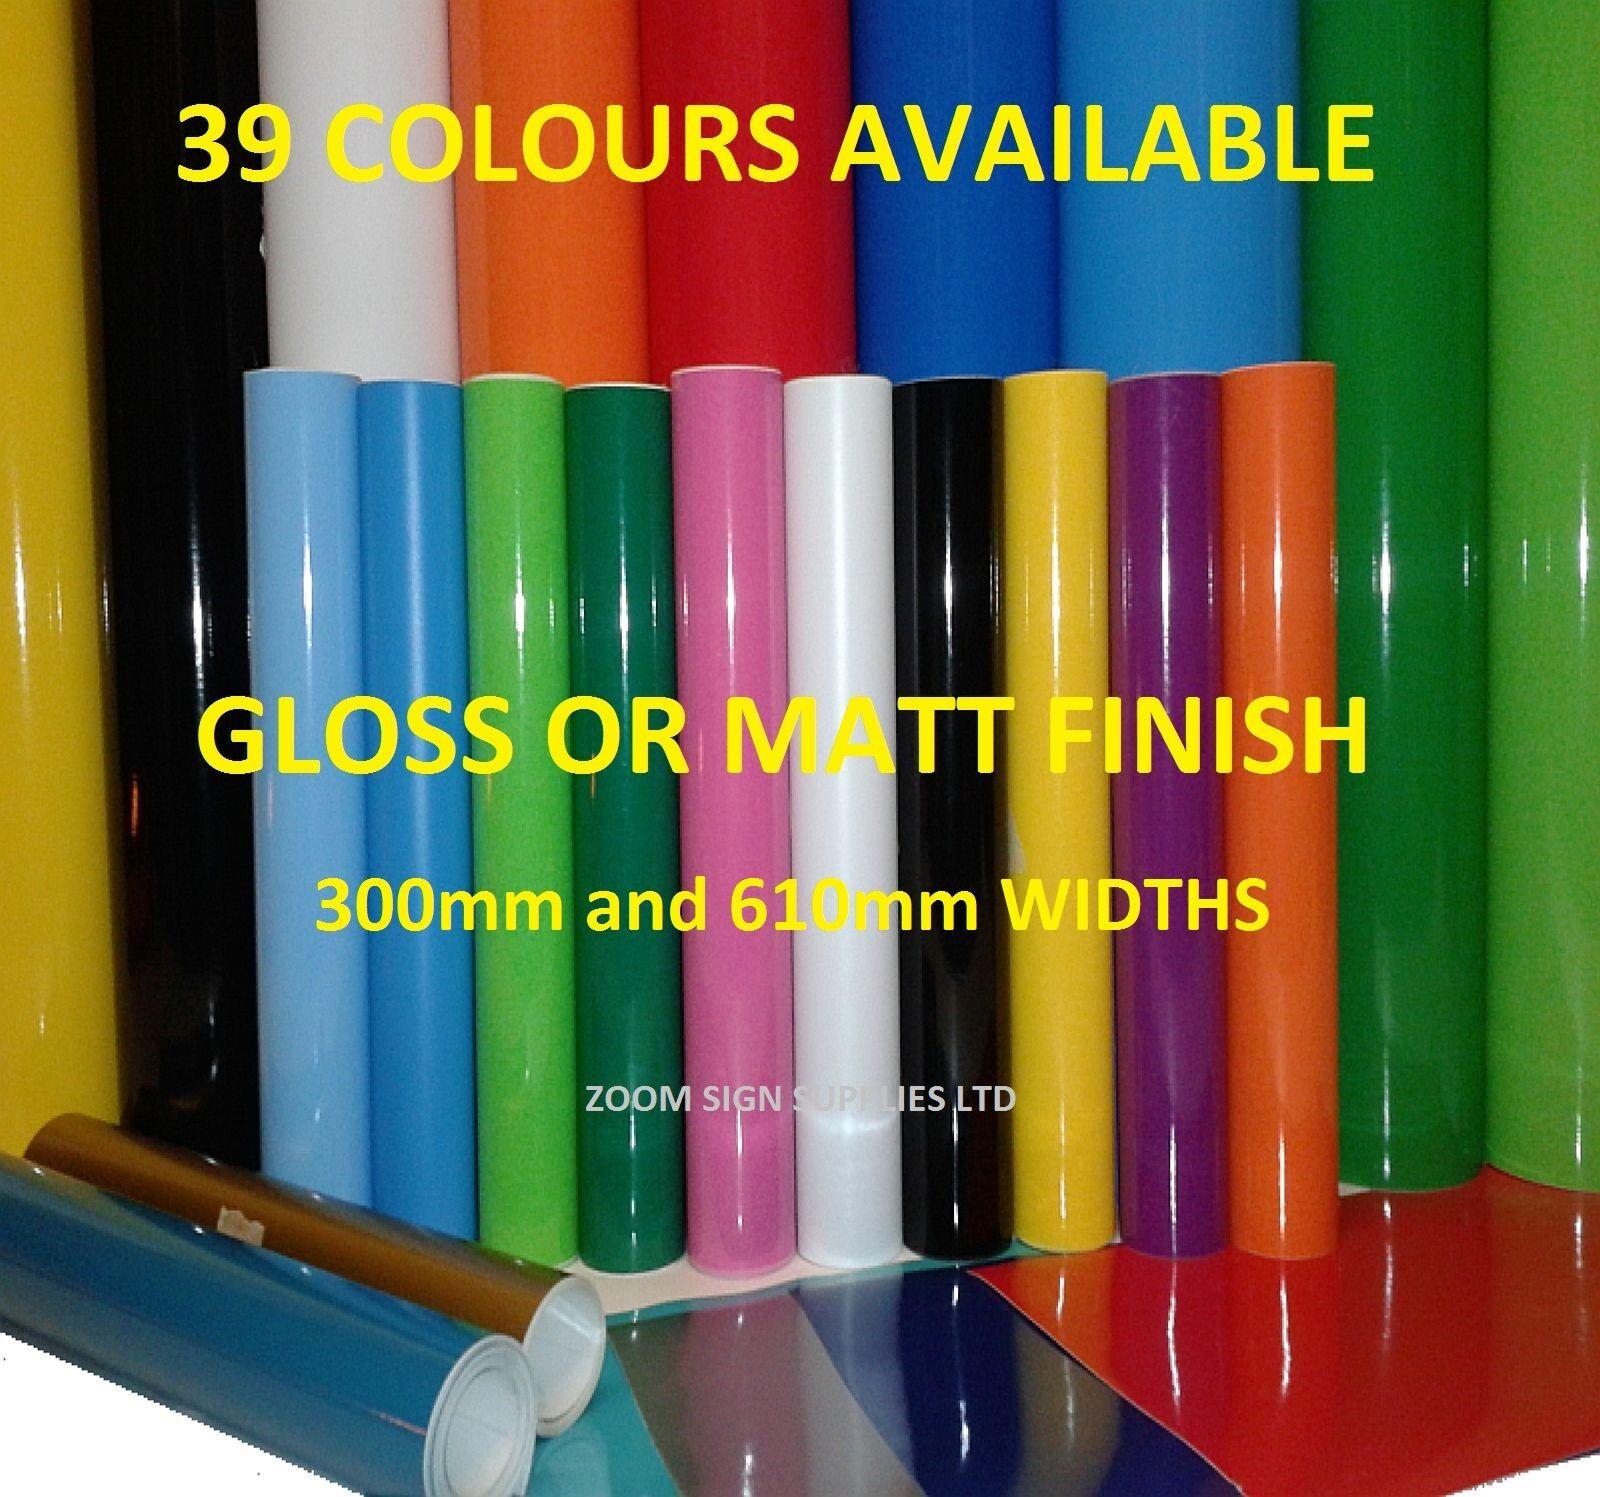 Polka Dots Pastel Blue Matt Self Adhesive Vinyl Sheet Cameo /& Portrait